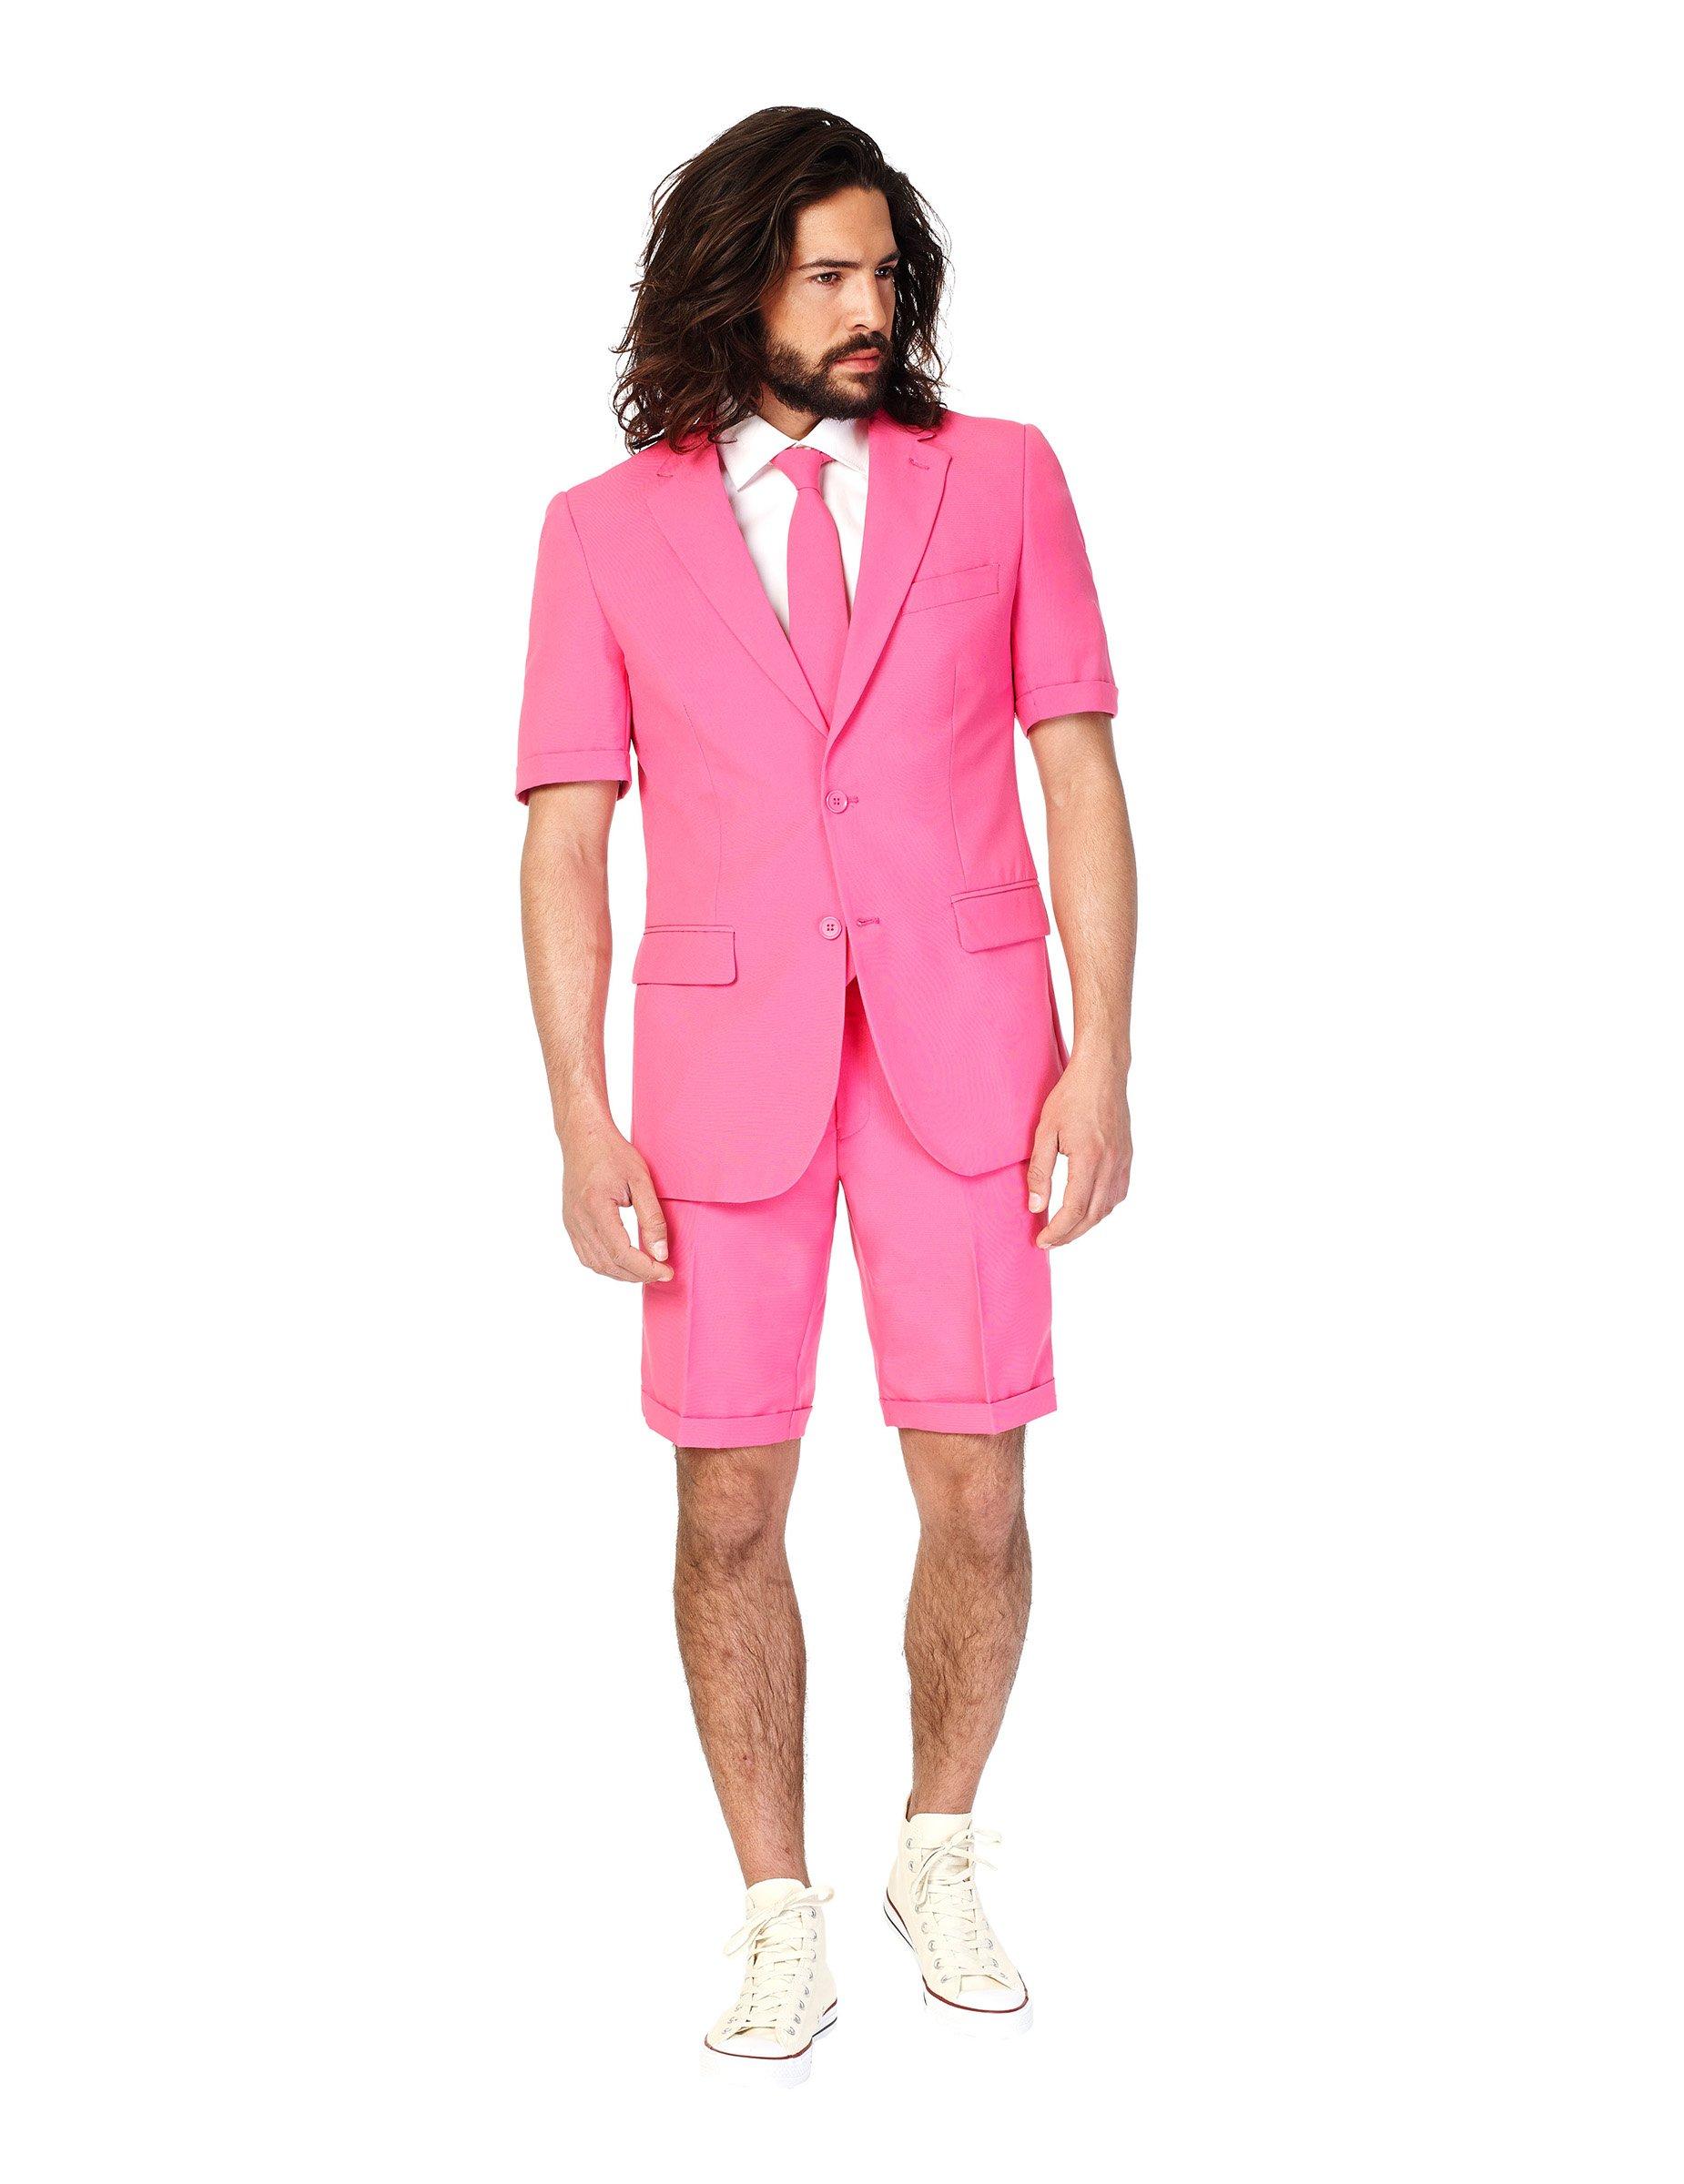 costume d 39 t mr pink homme opposuits deguise toi. Black Bedroom Furniture Sets. Home Design Ideas